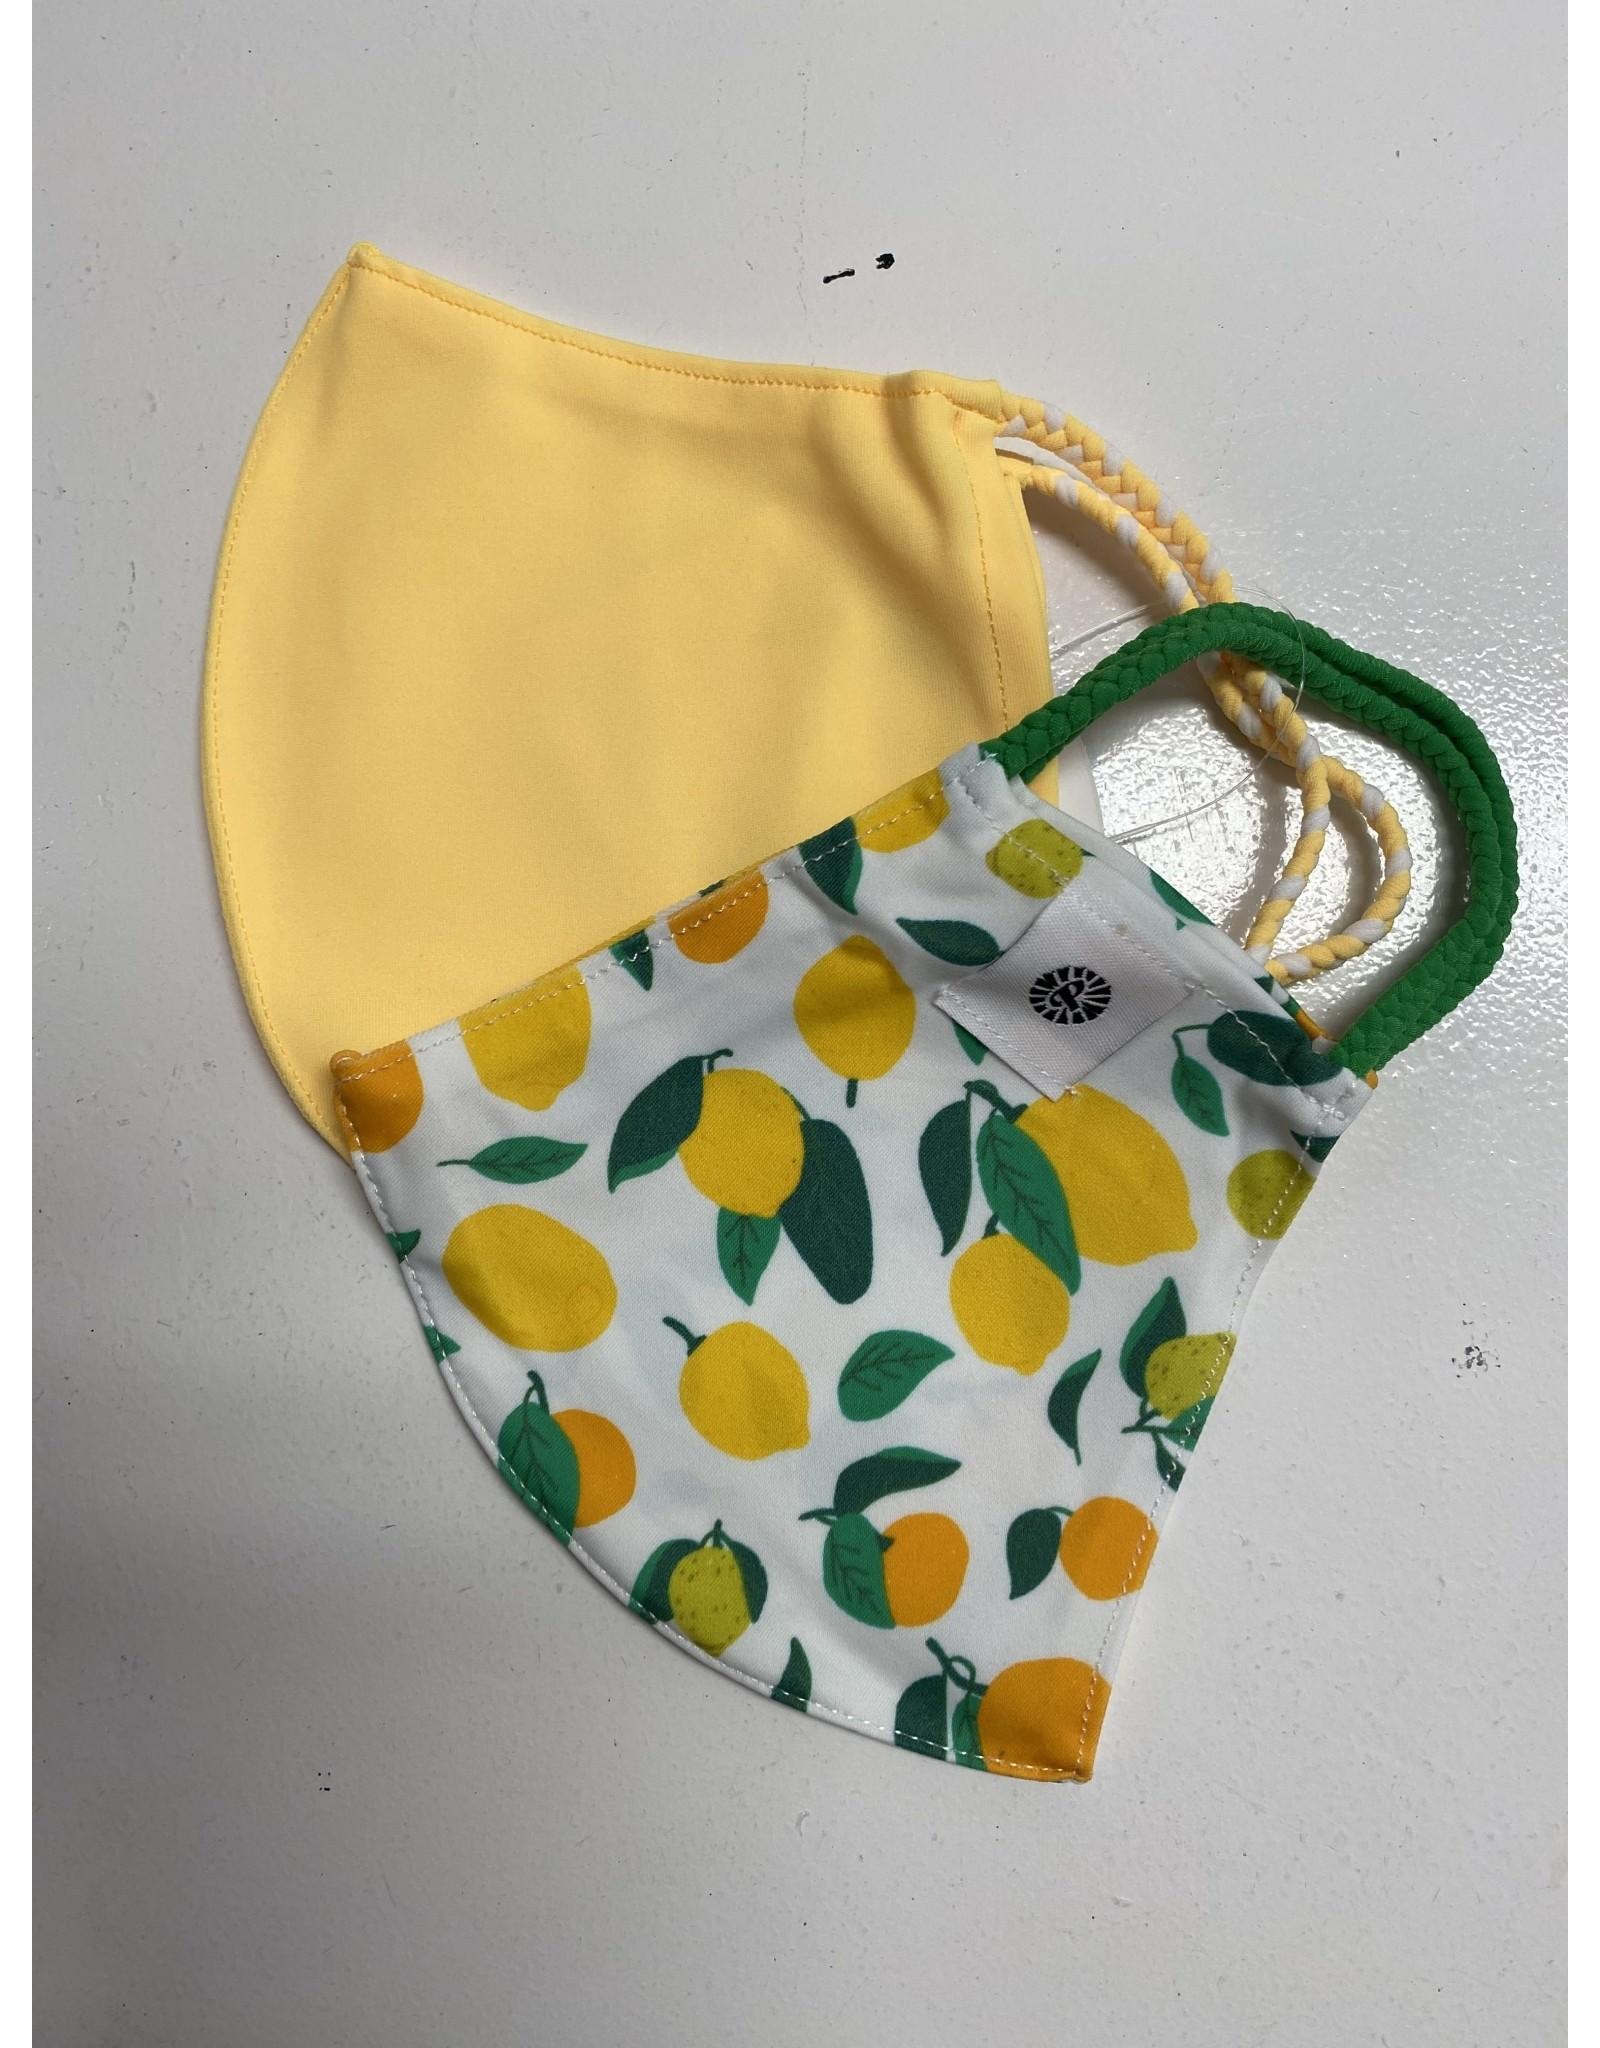 Pomchies Mask - Citrus Fruit/Yellow